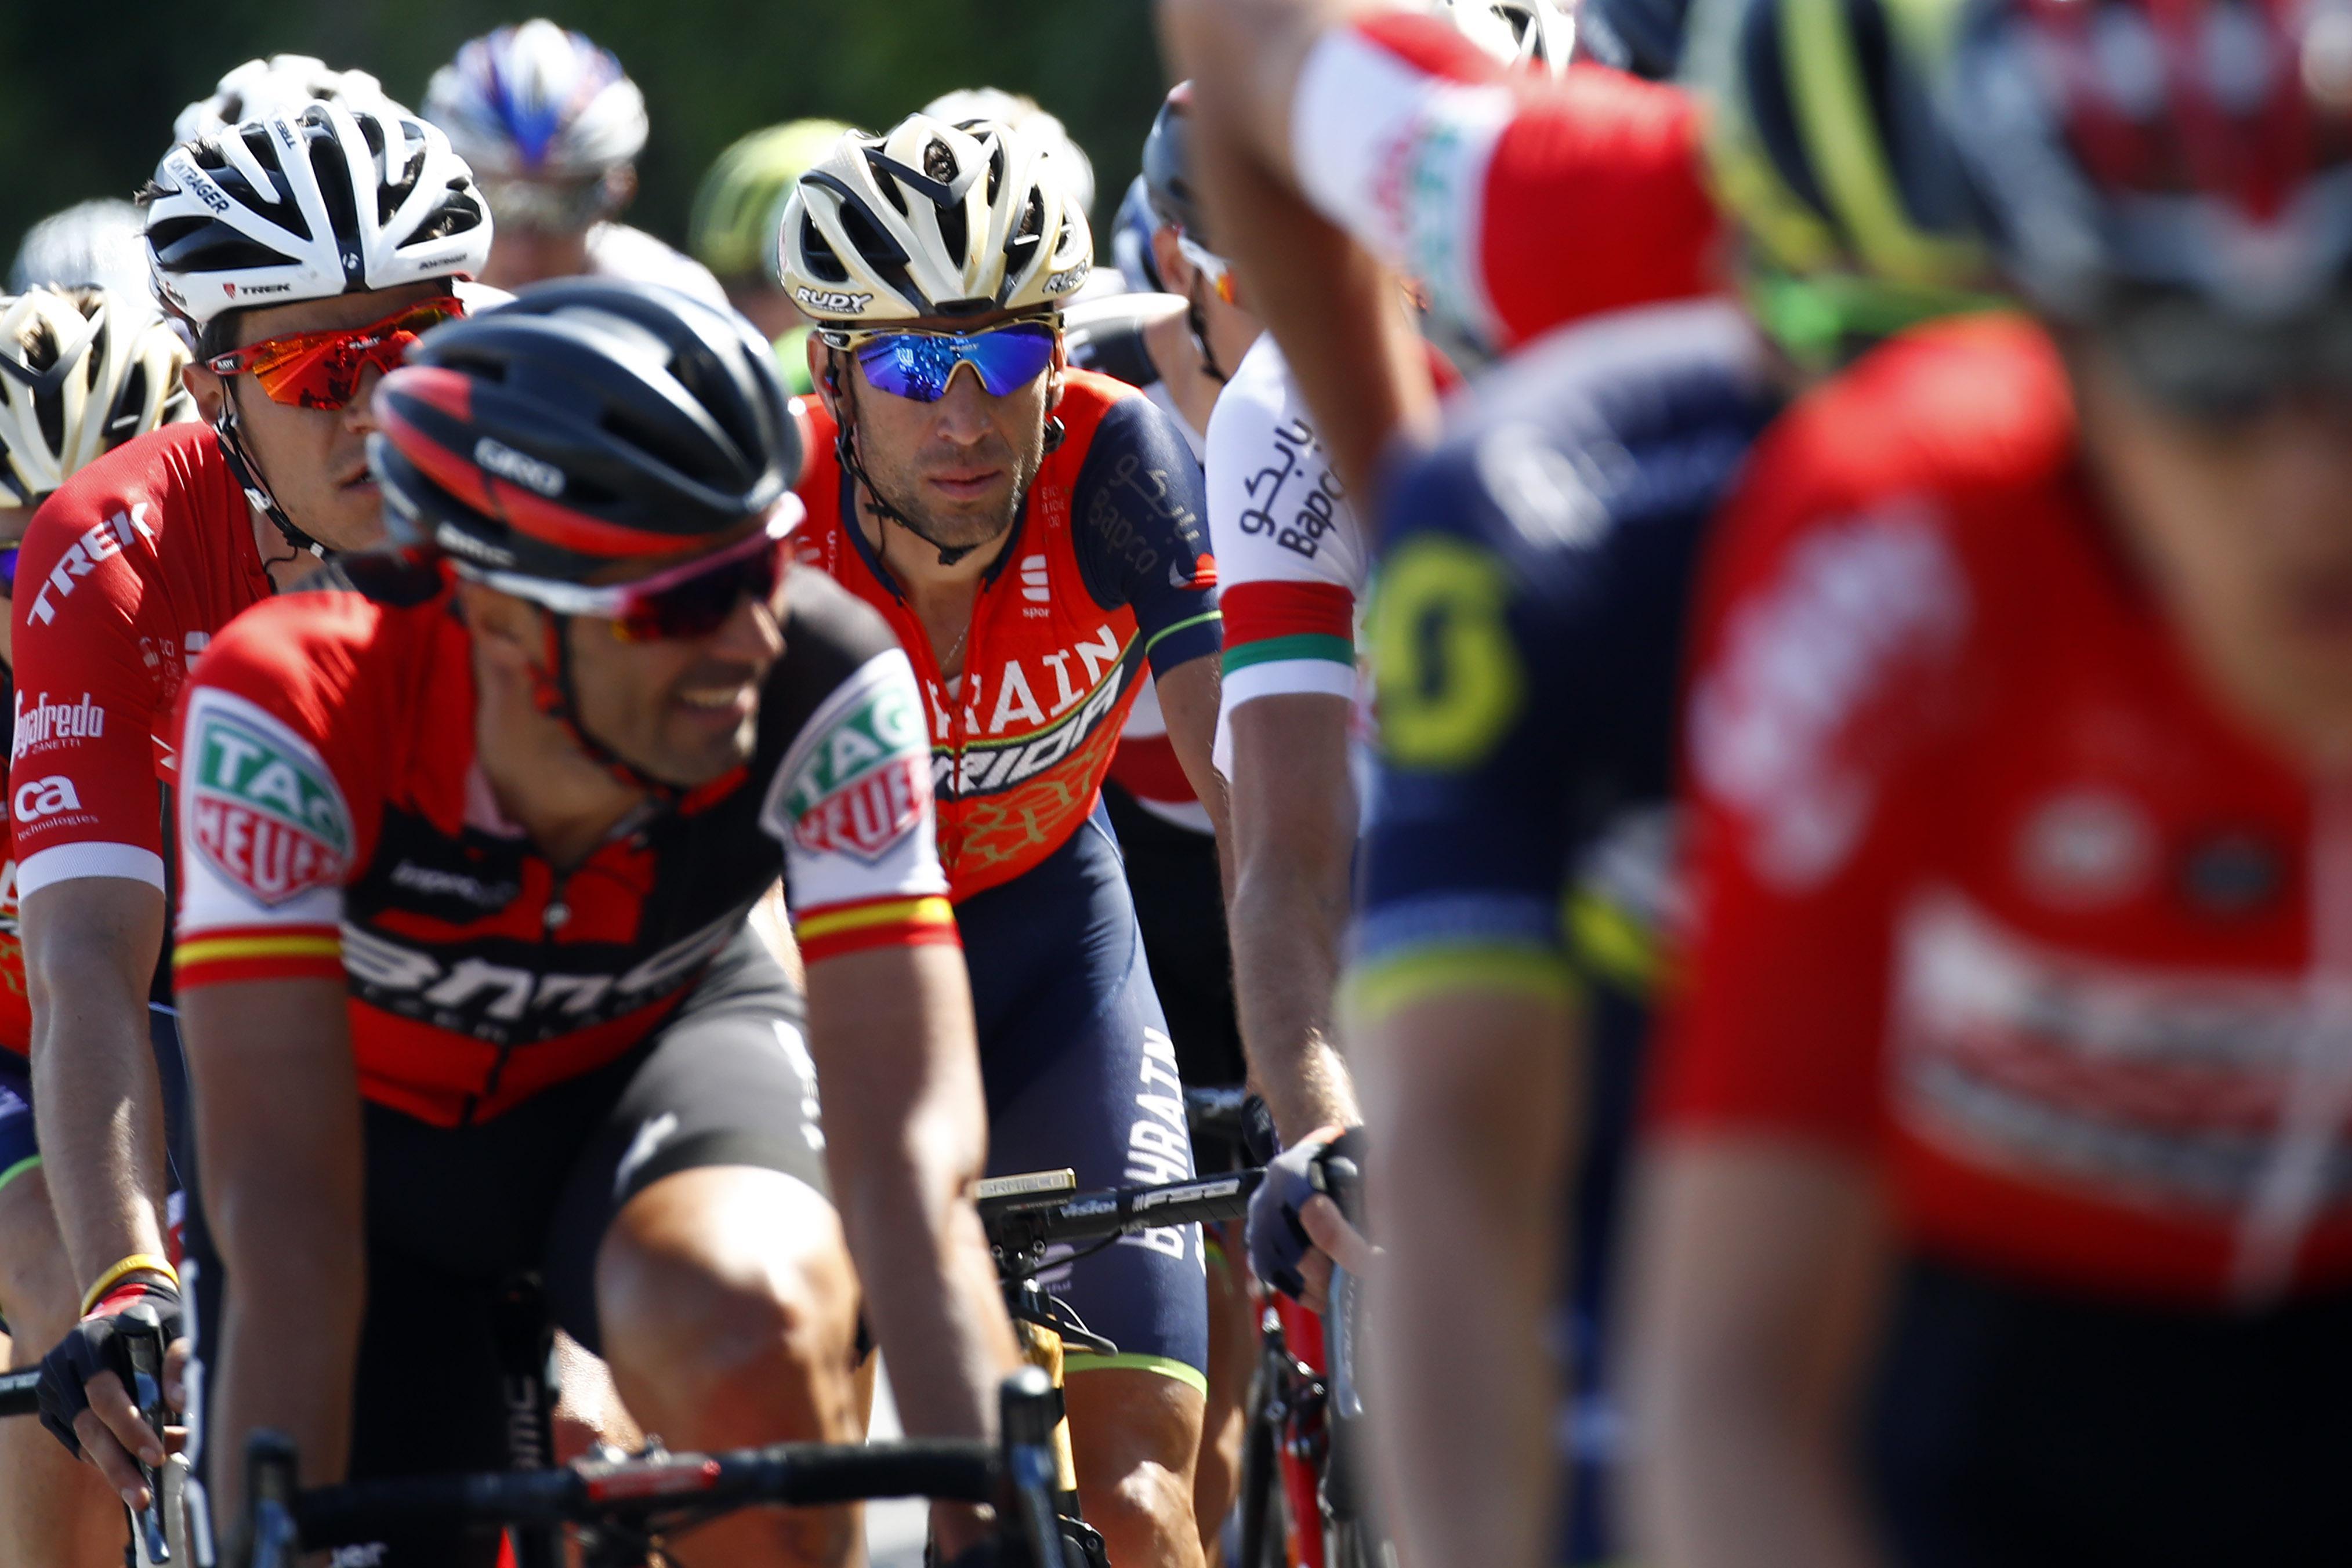 Luka Pibernik's Bahrain-Merida team-mate Vincenzo Nibali (centre, rear) was the local hero as he rode into his home town of Messina